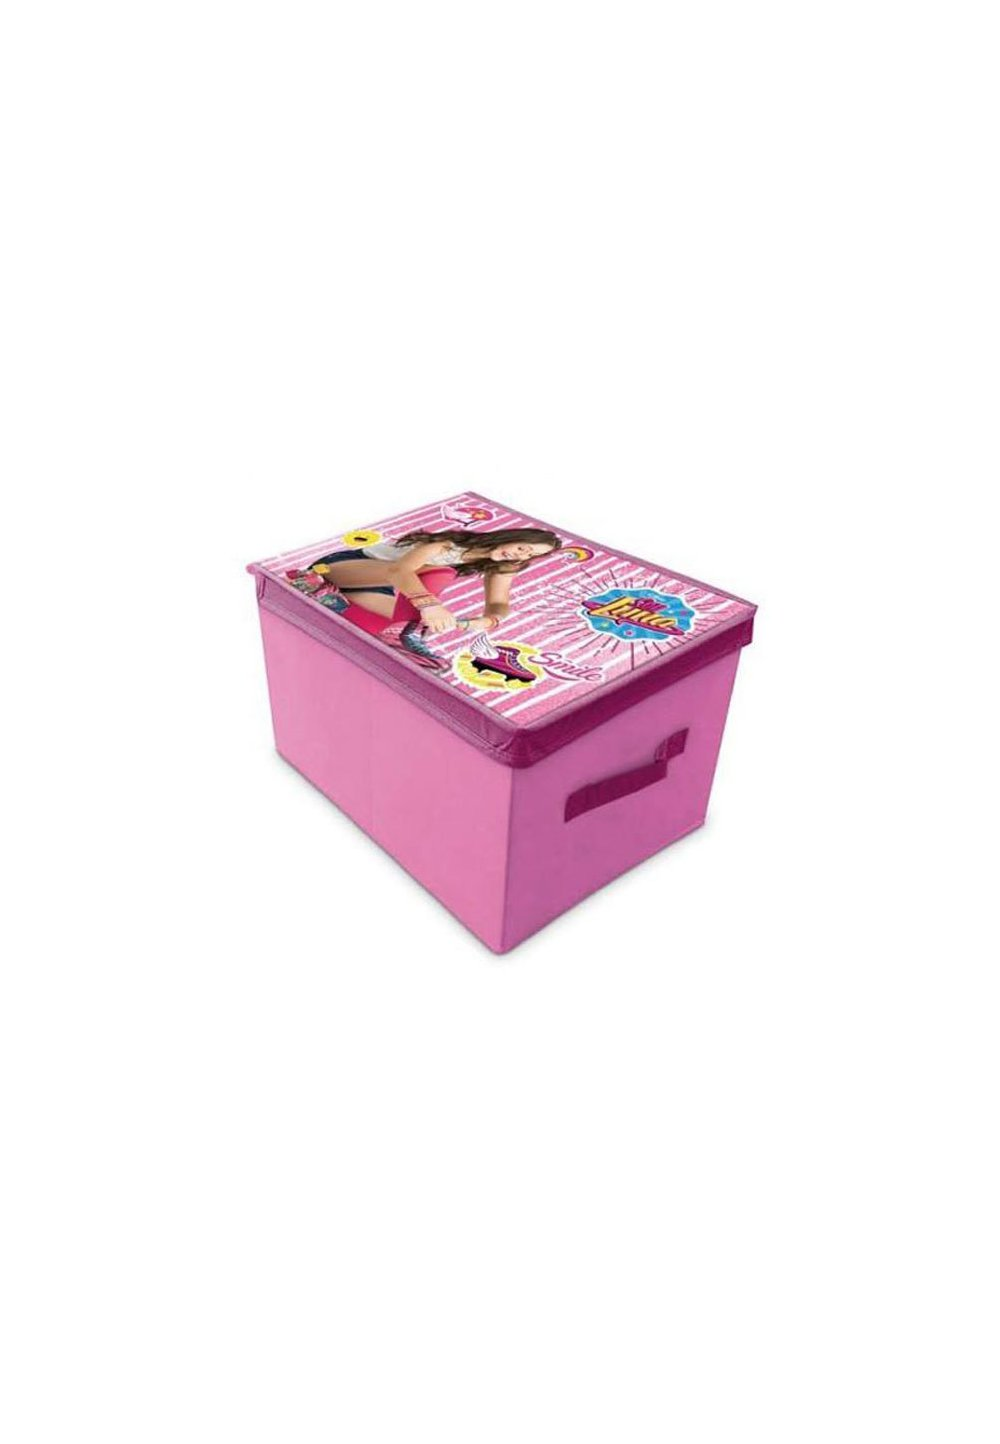 Cutie depozitare, Soy Luna, roz imagine